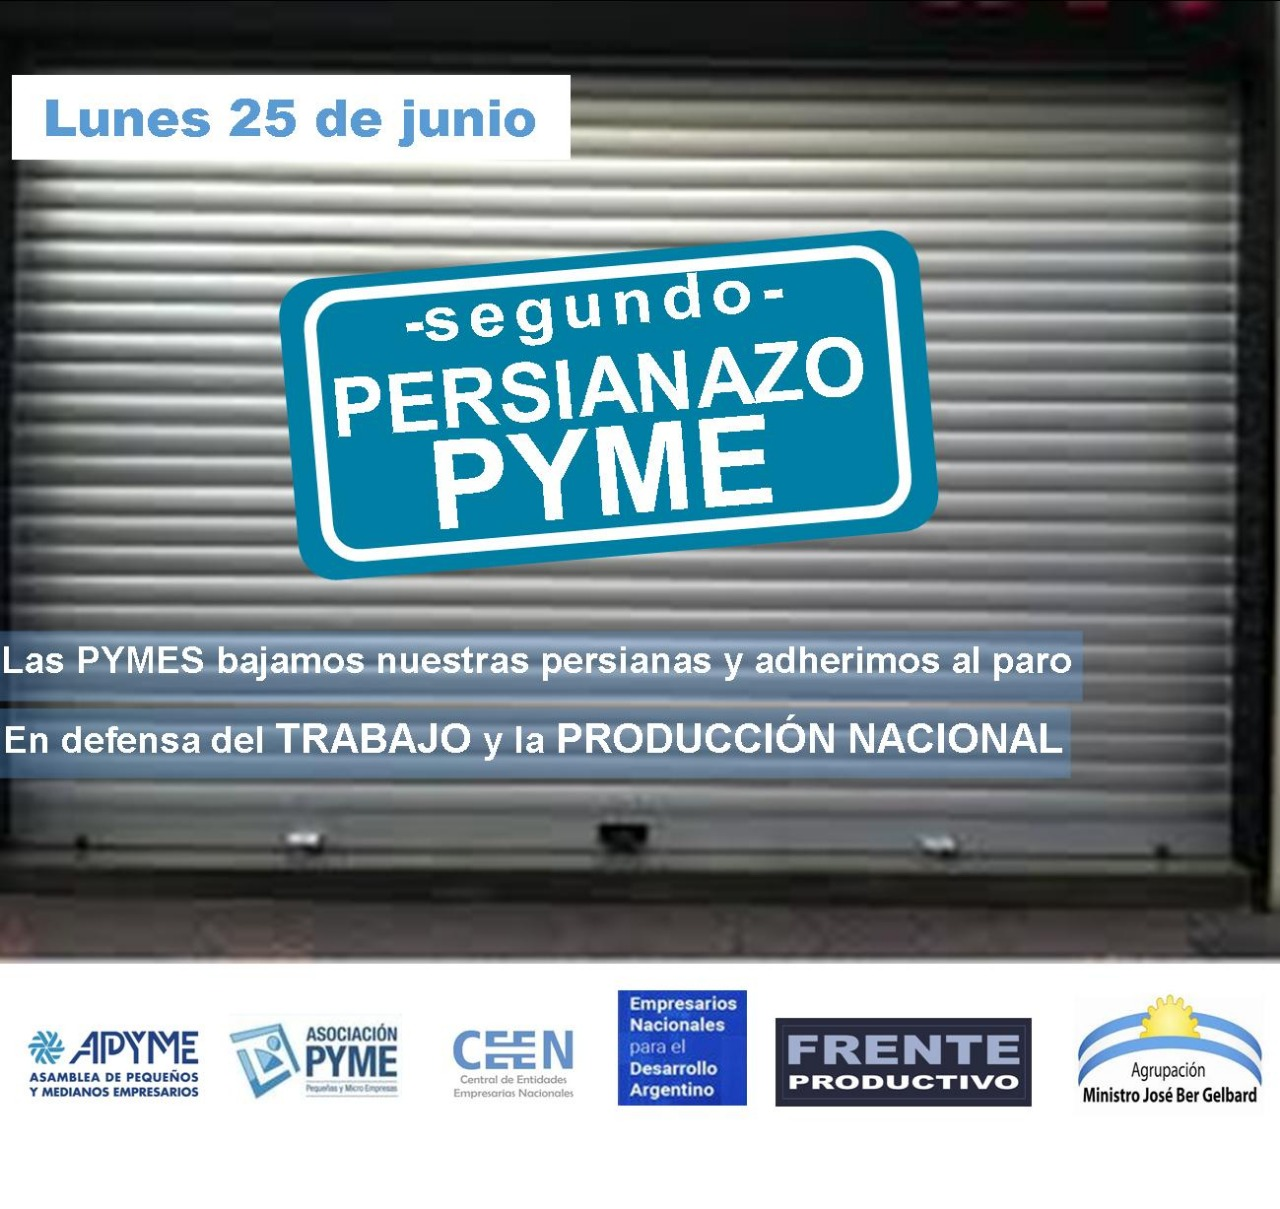 http://www.lacorameco.com.ar/imagenes/persianazo_pyme.jpg